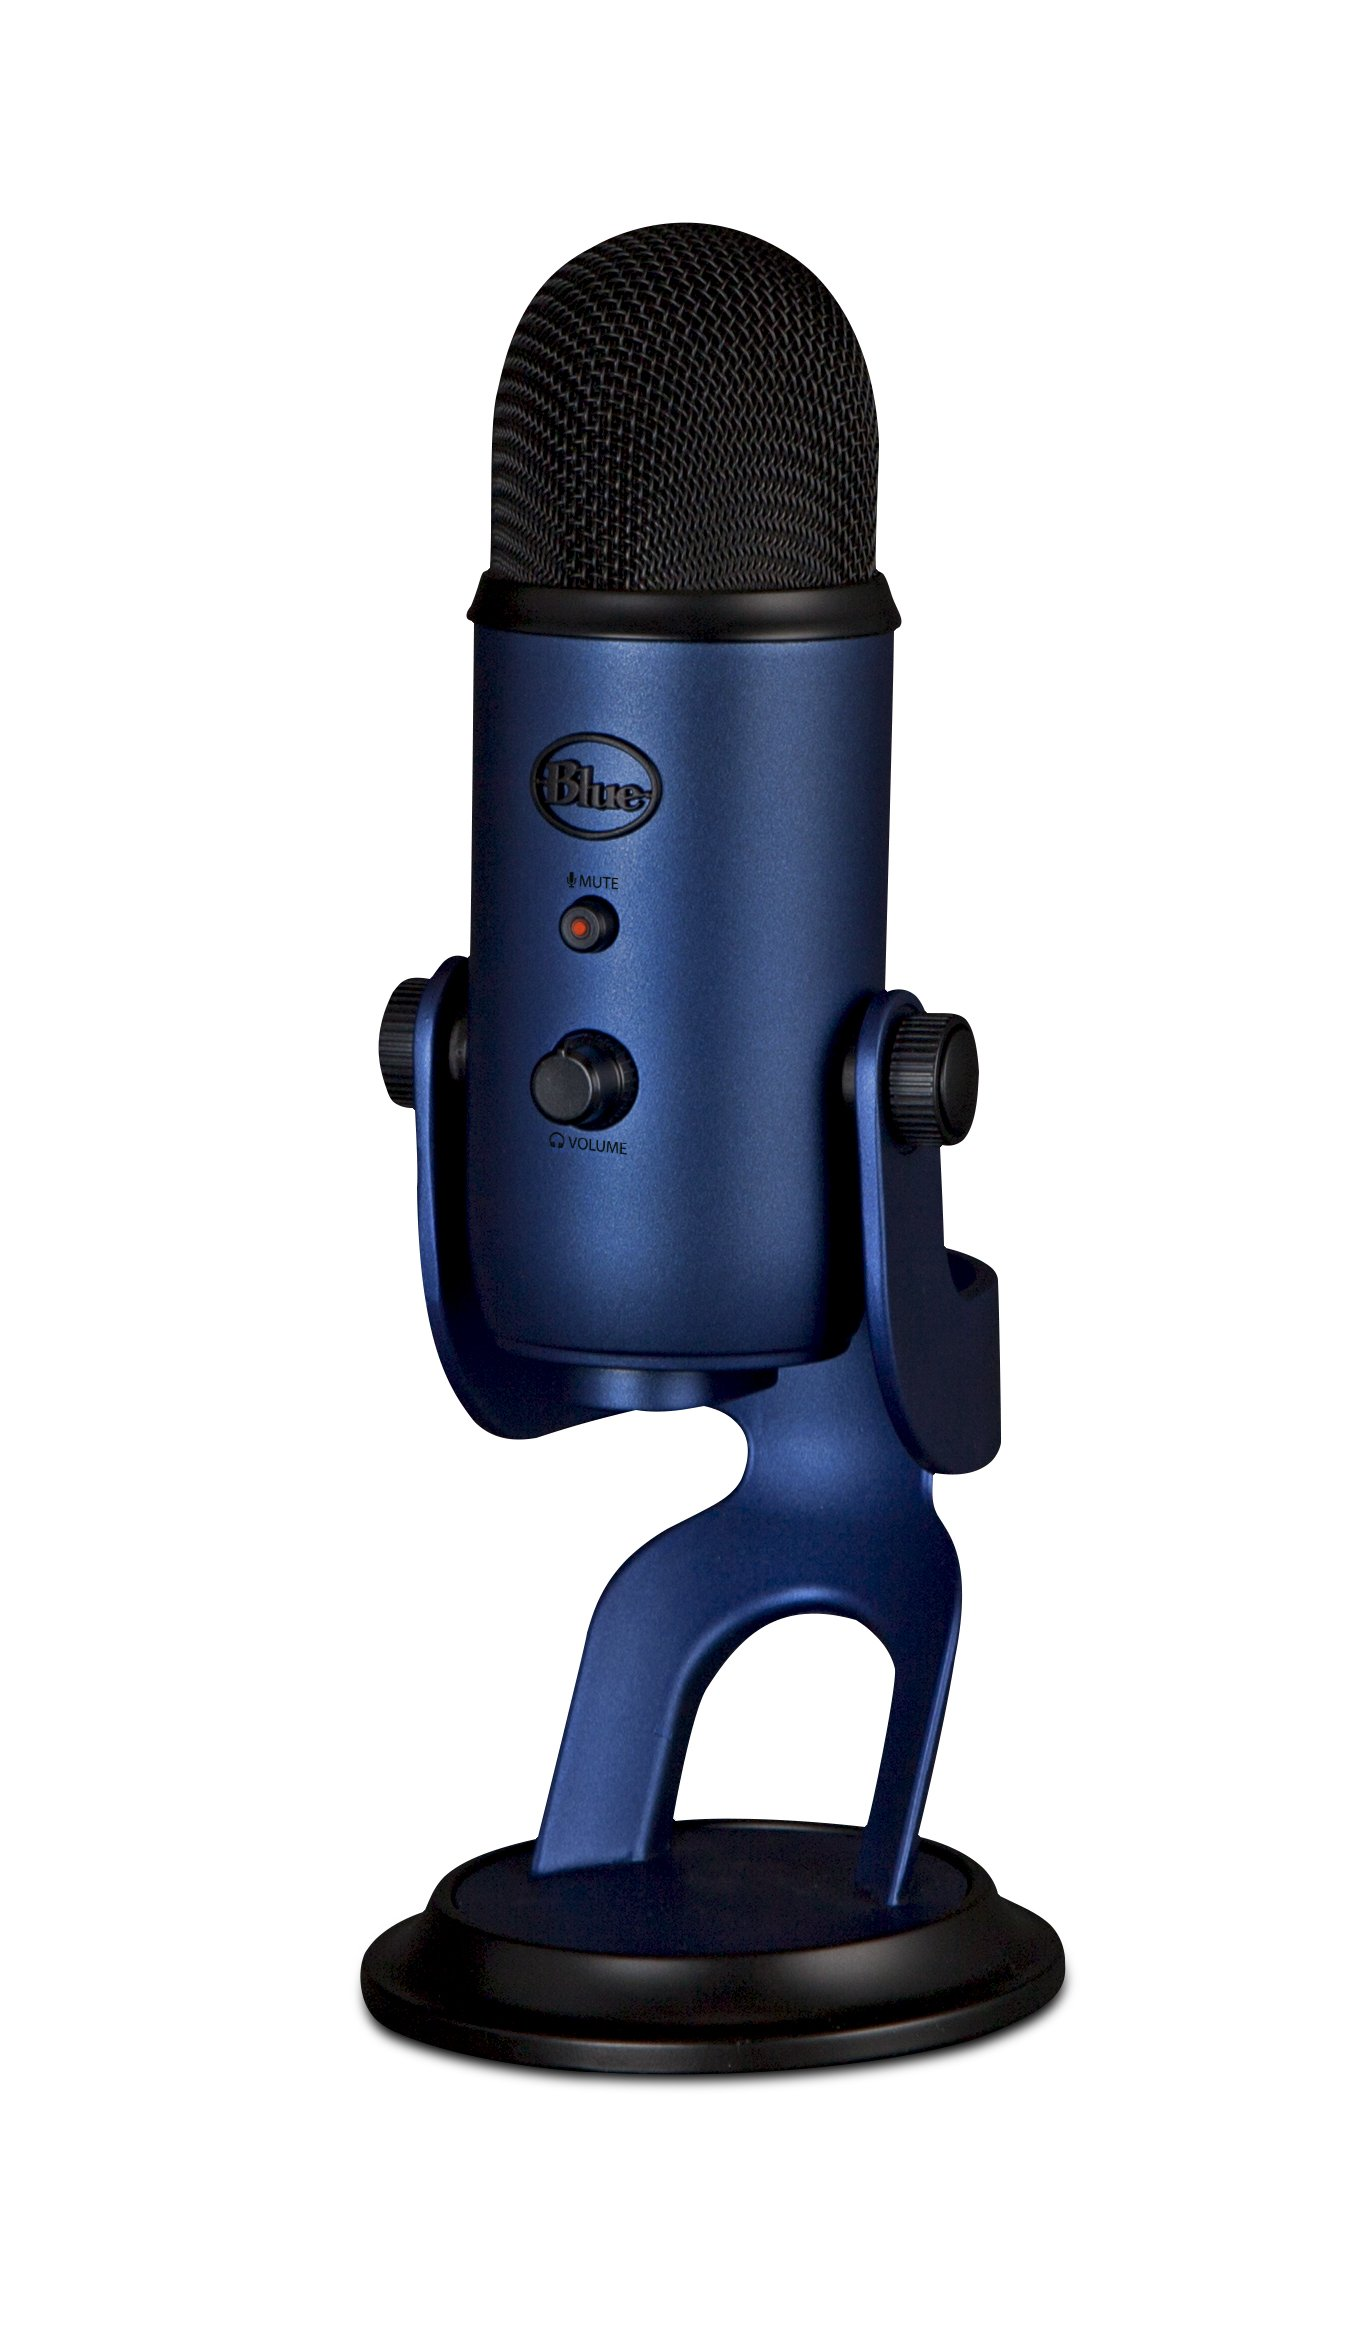 Blue Microphones Yeti USB Microphone, Midnight Blue - Renewed